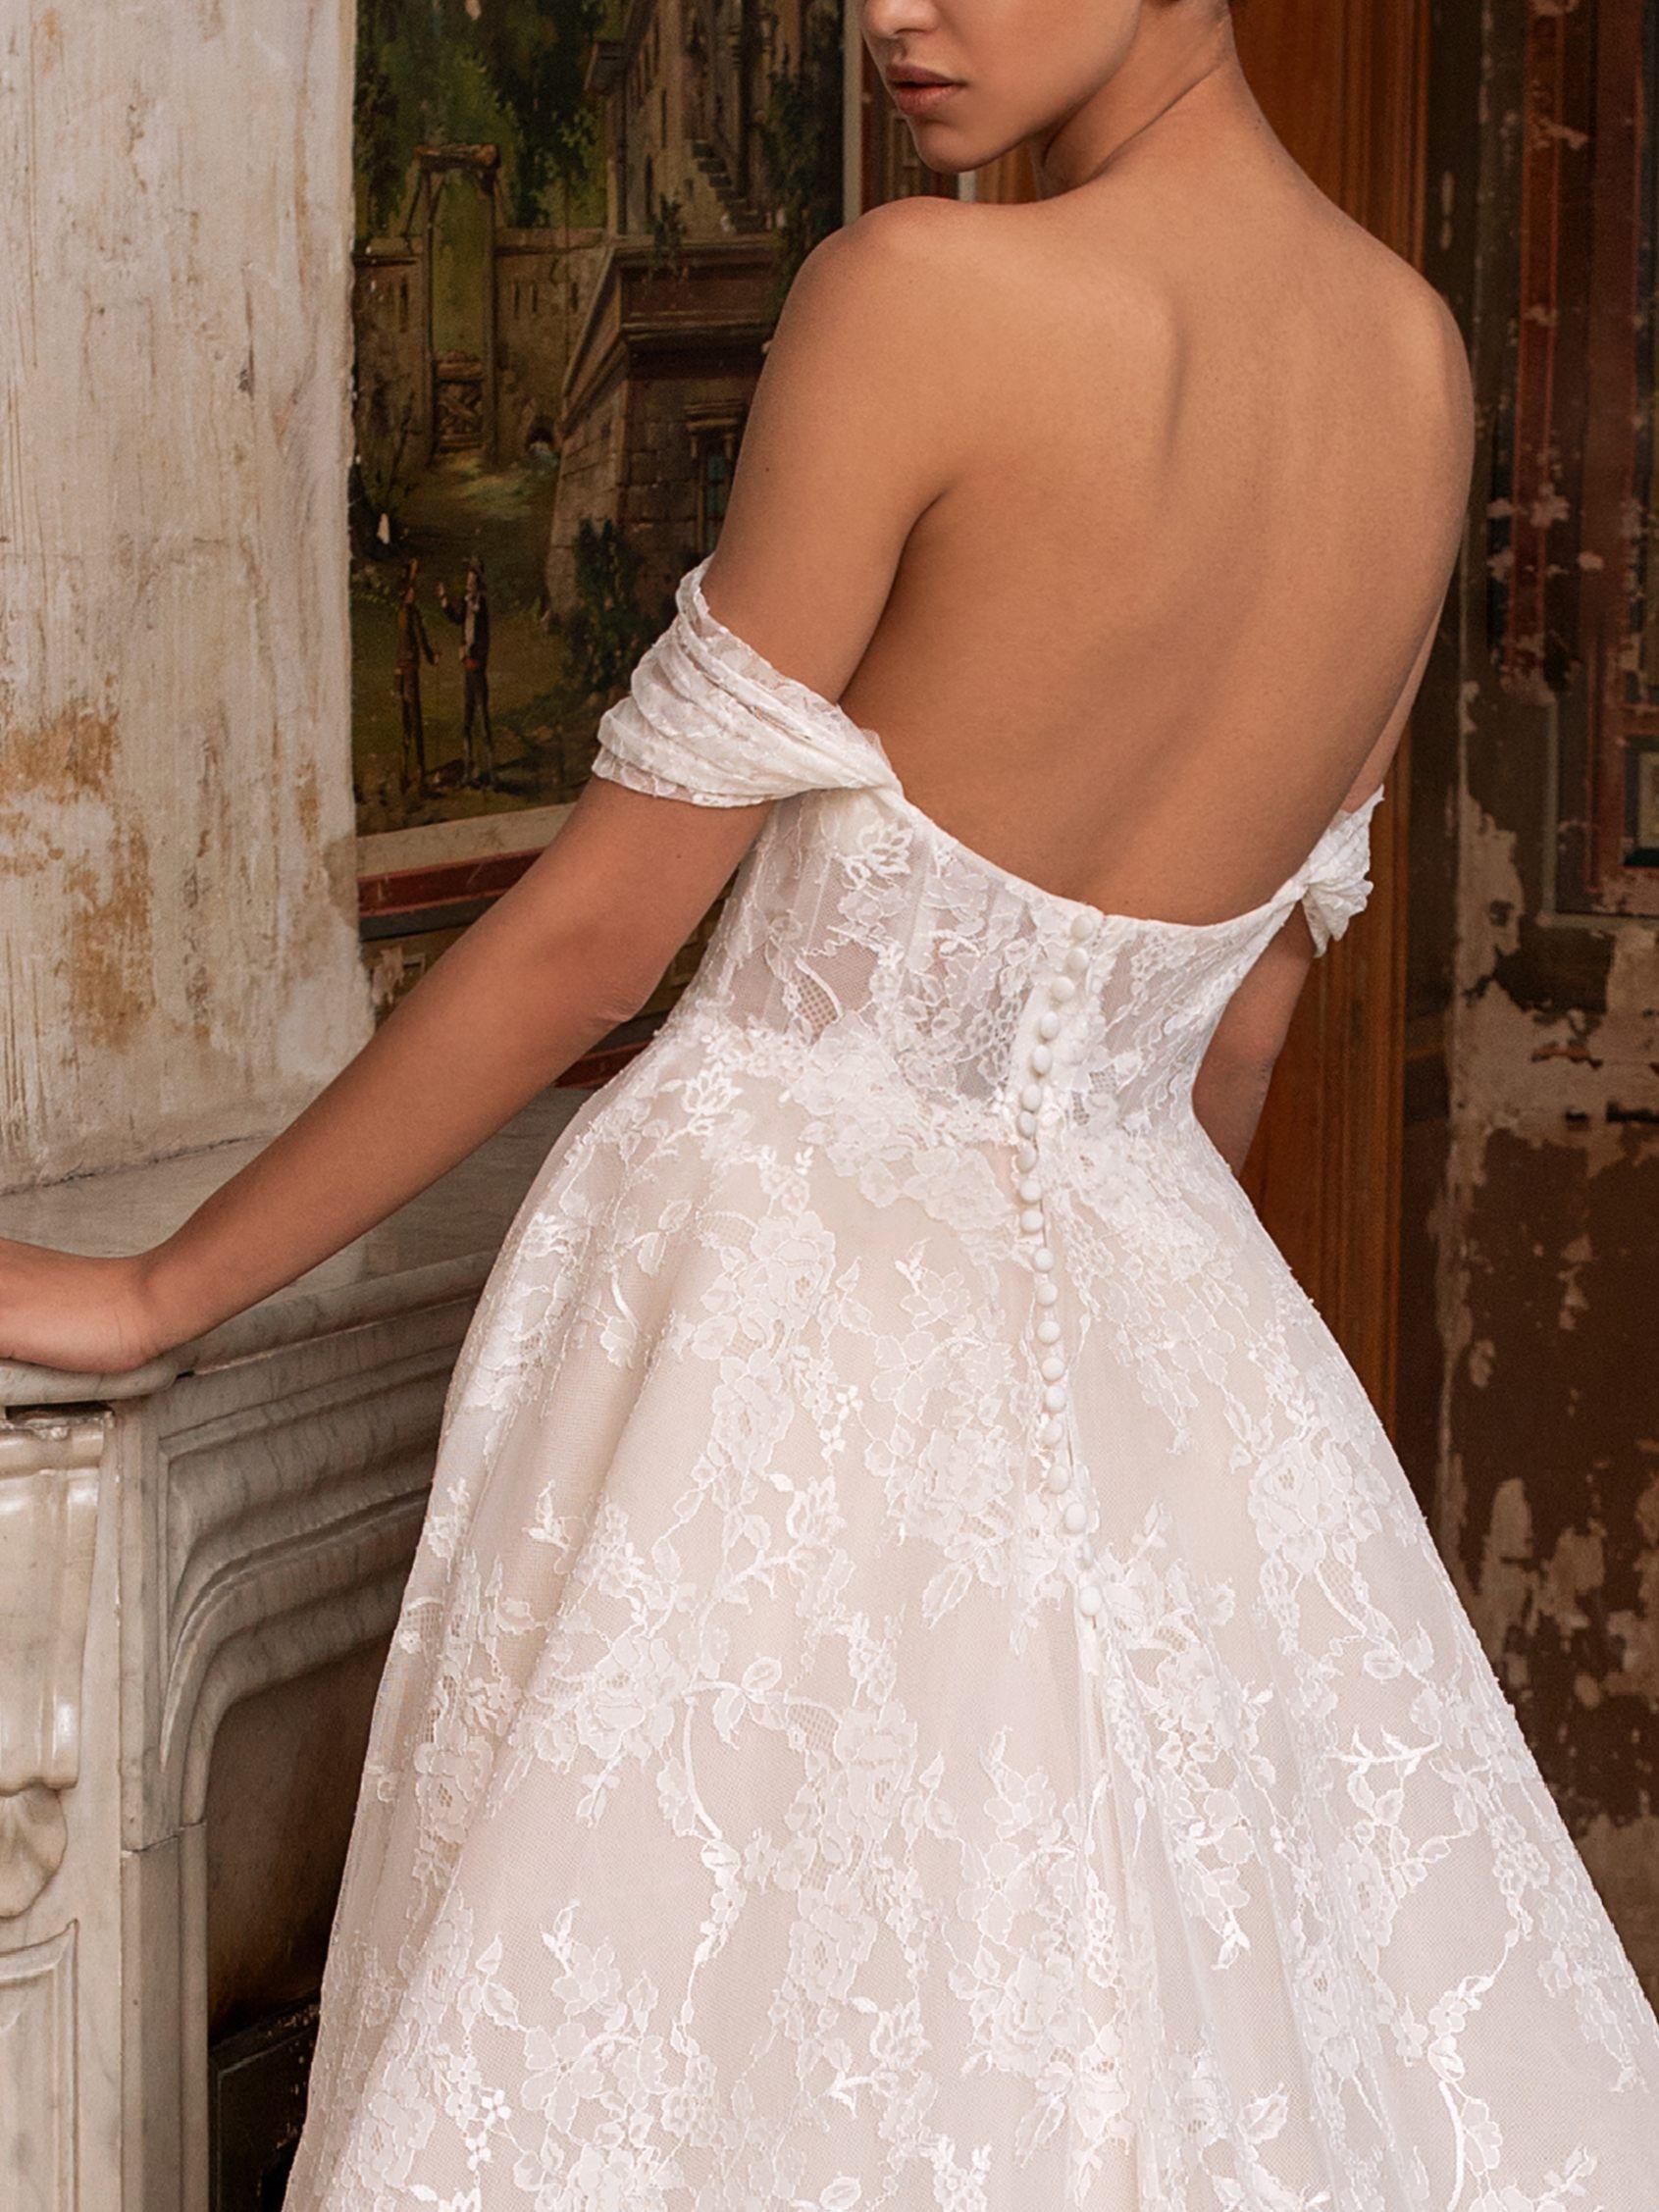 Superba Evening Dresses For Weddings Wedding Dresses Princess Wedding Dresses [ jpg ]